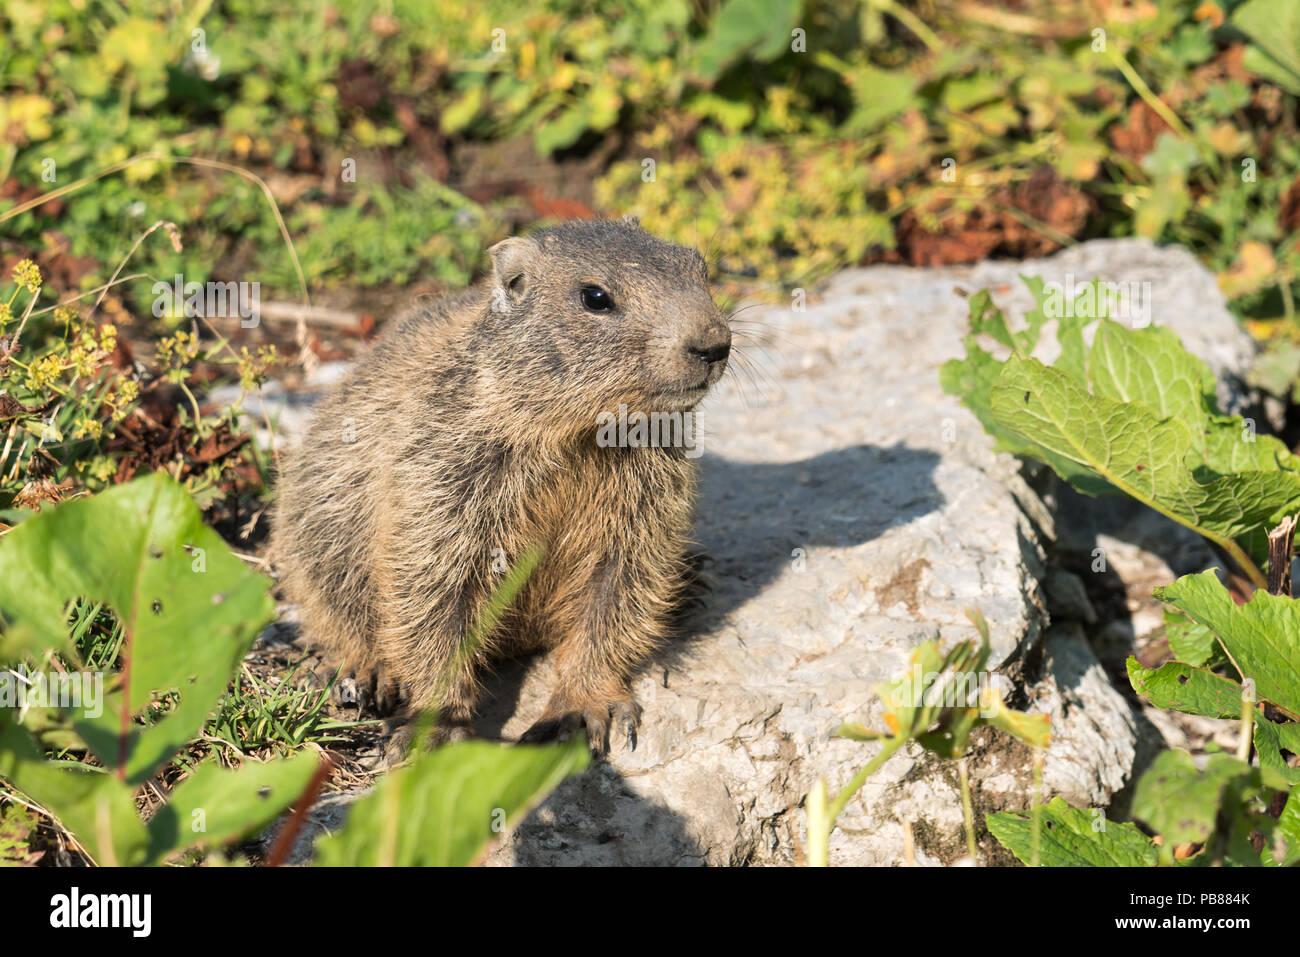 Curious young alpine marmot cub in the European Alps of Malbun, Liechtenstein - Stock Image